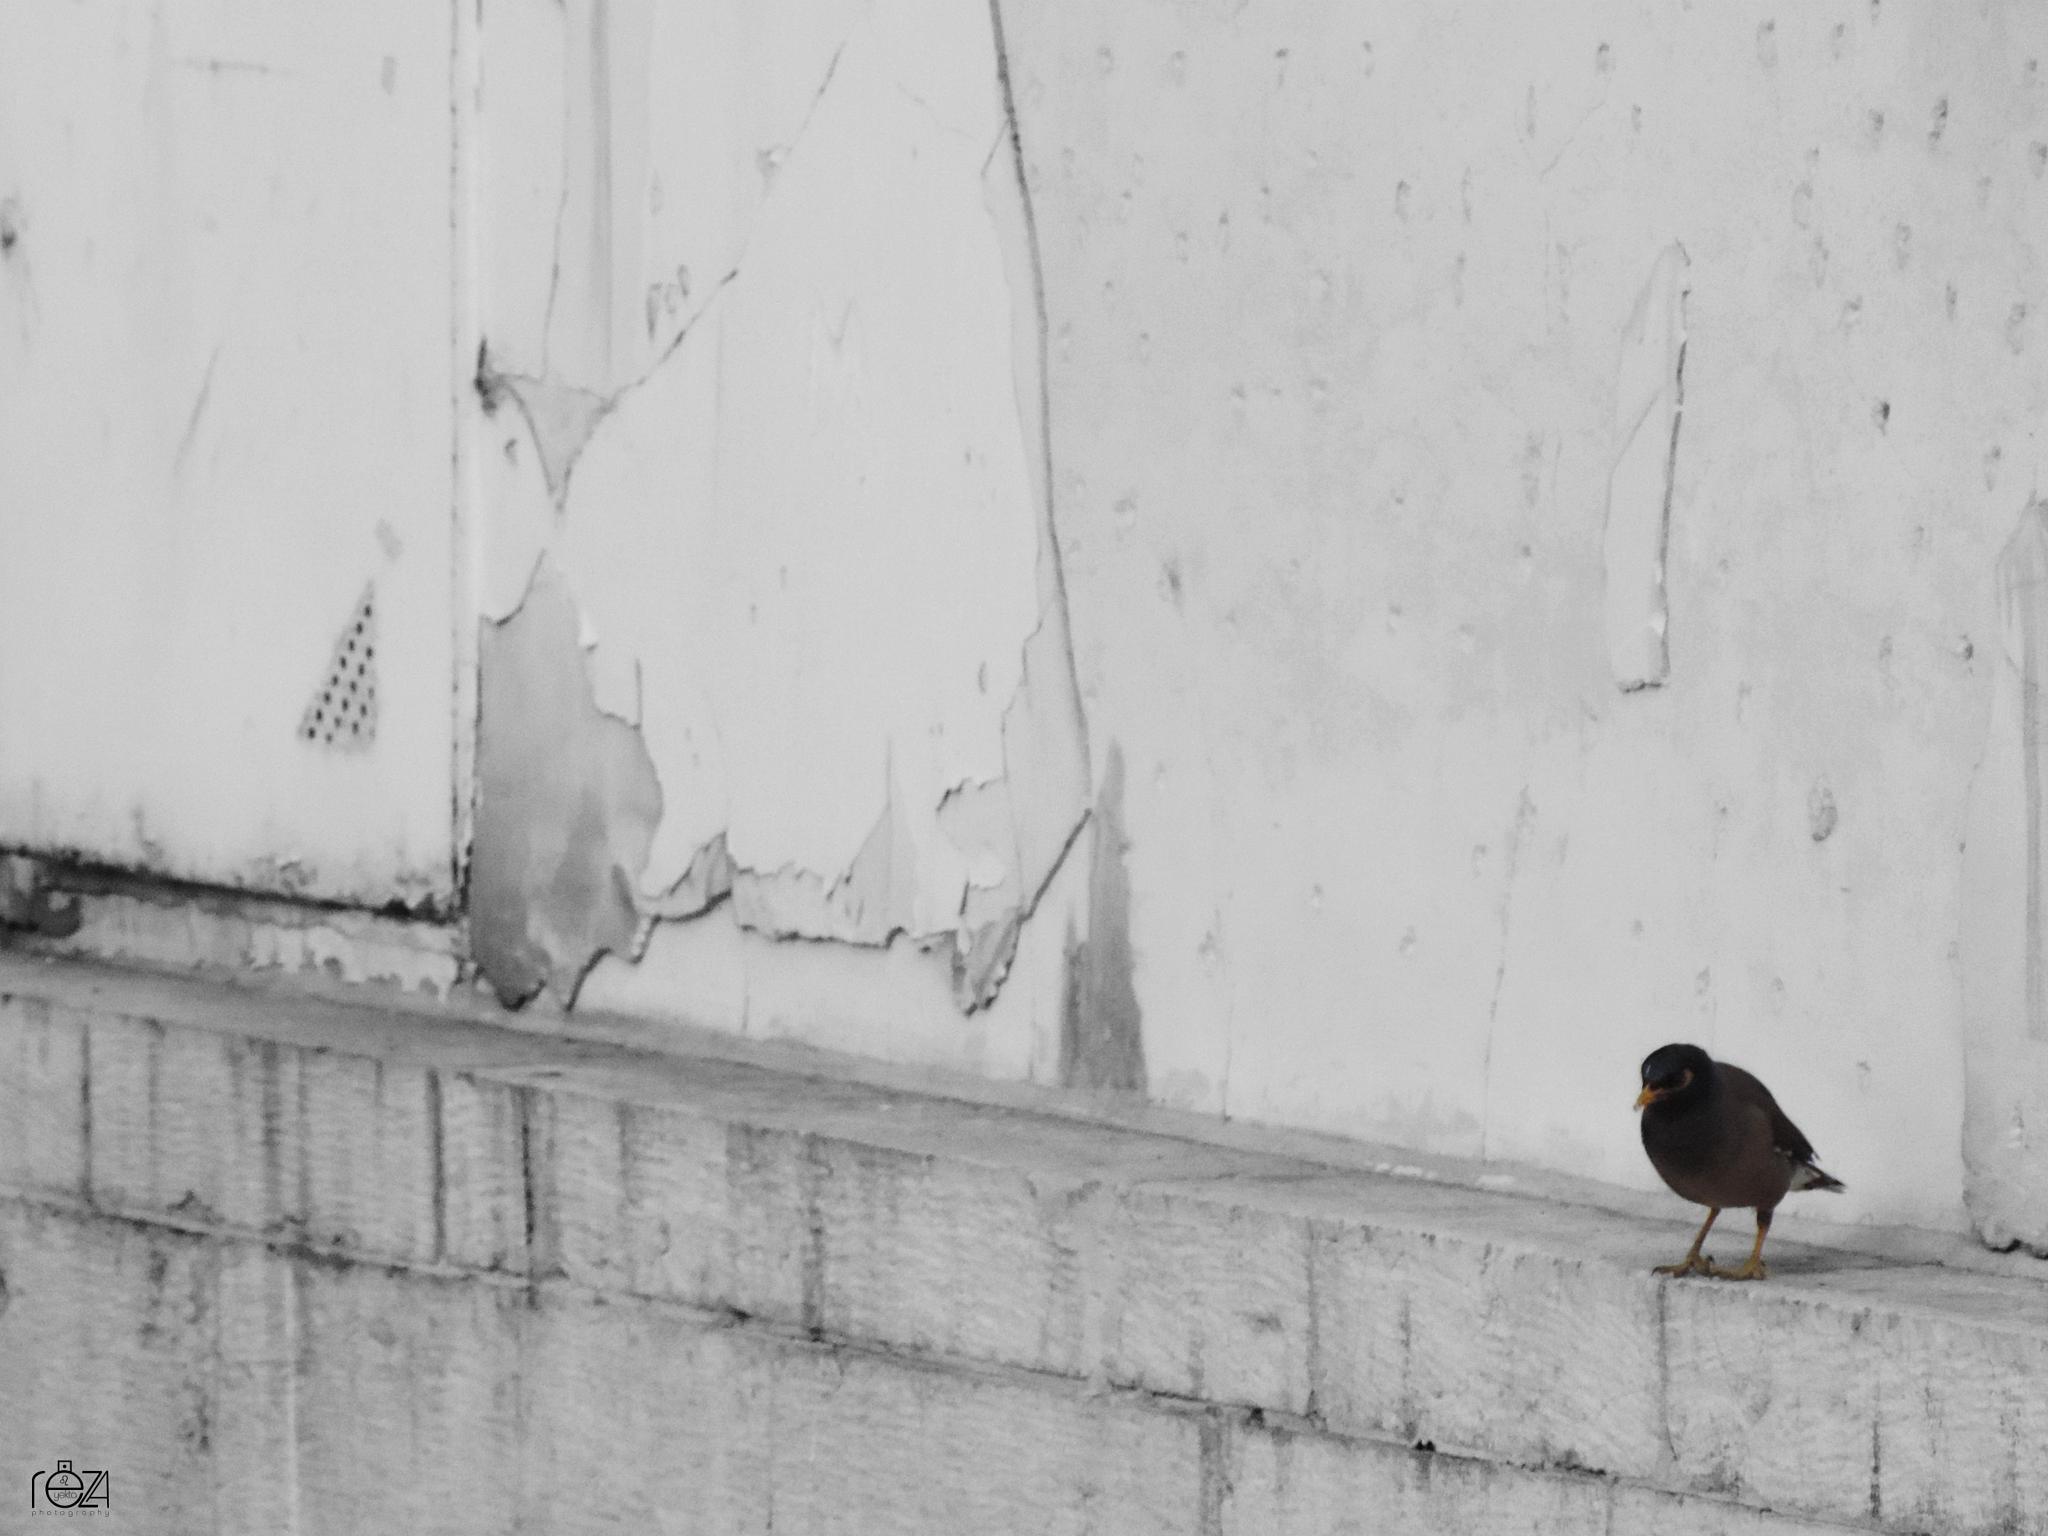 Untitled by Reza Yekta